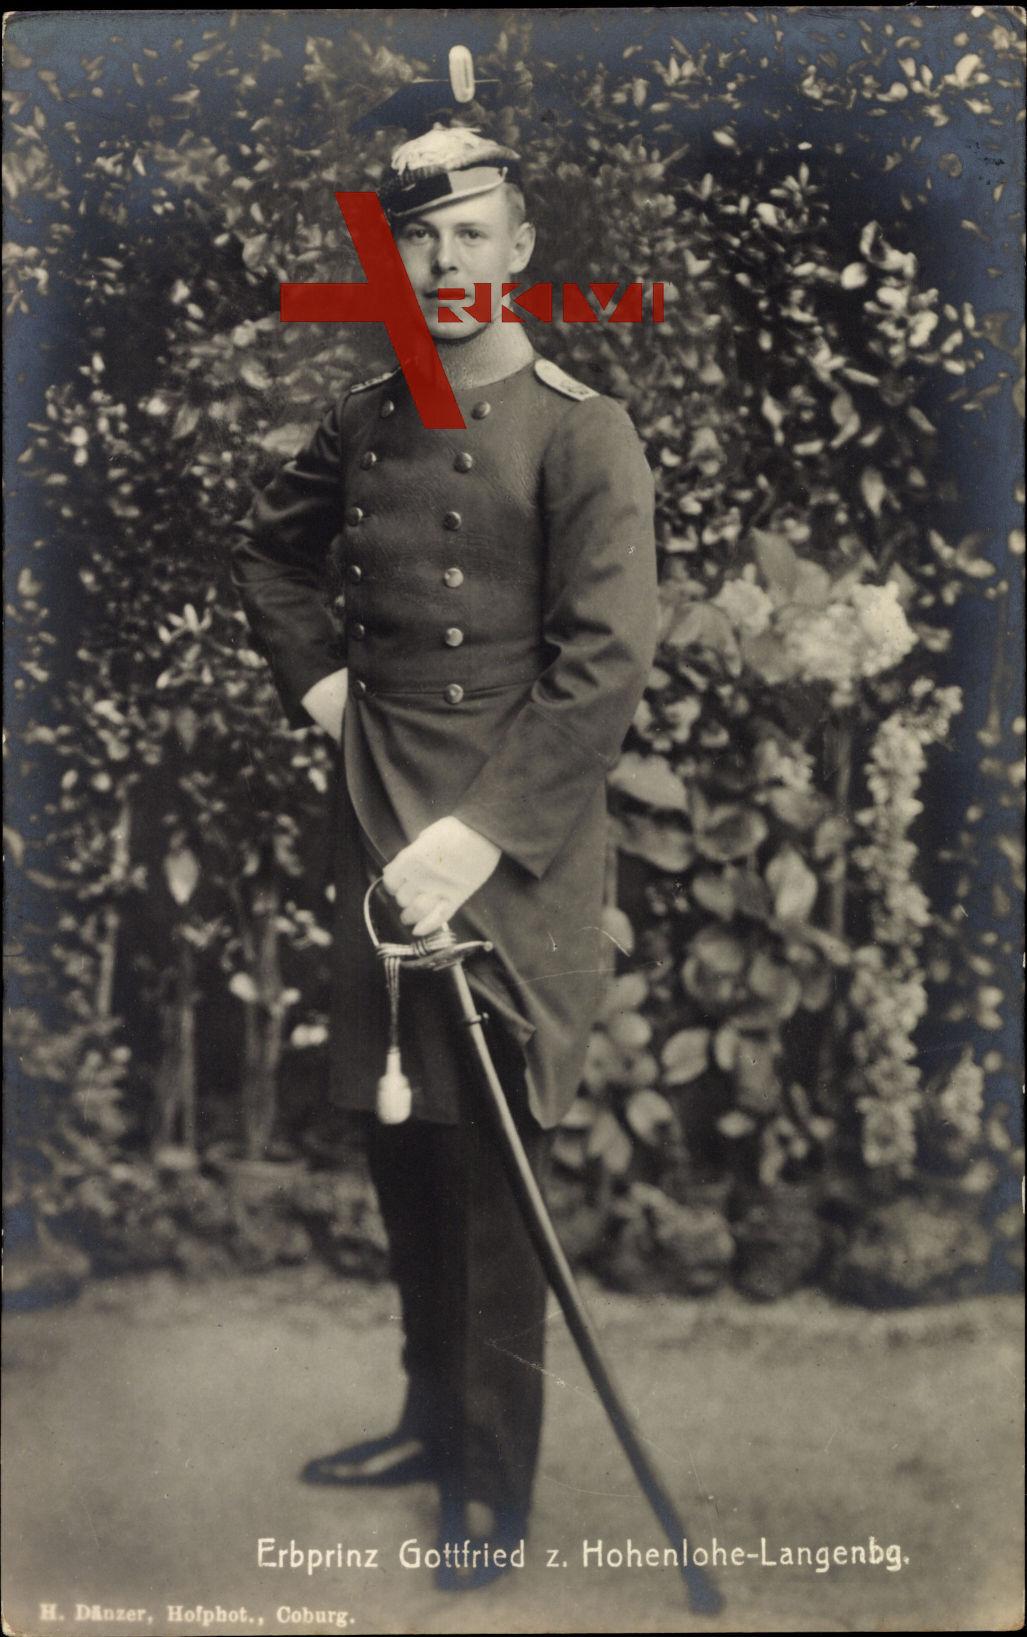 Erbprinz Gottfried zu Hohenlohe Langenburg, Uniform, Säbel.